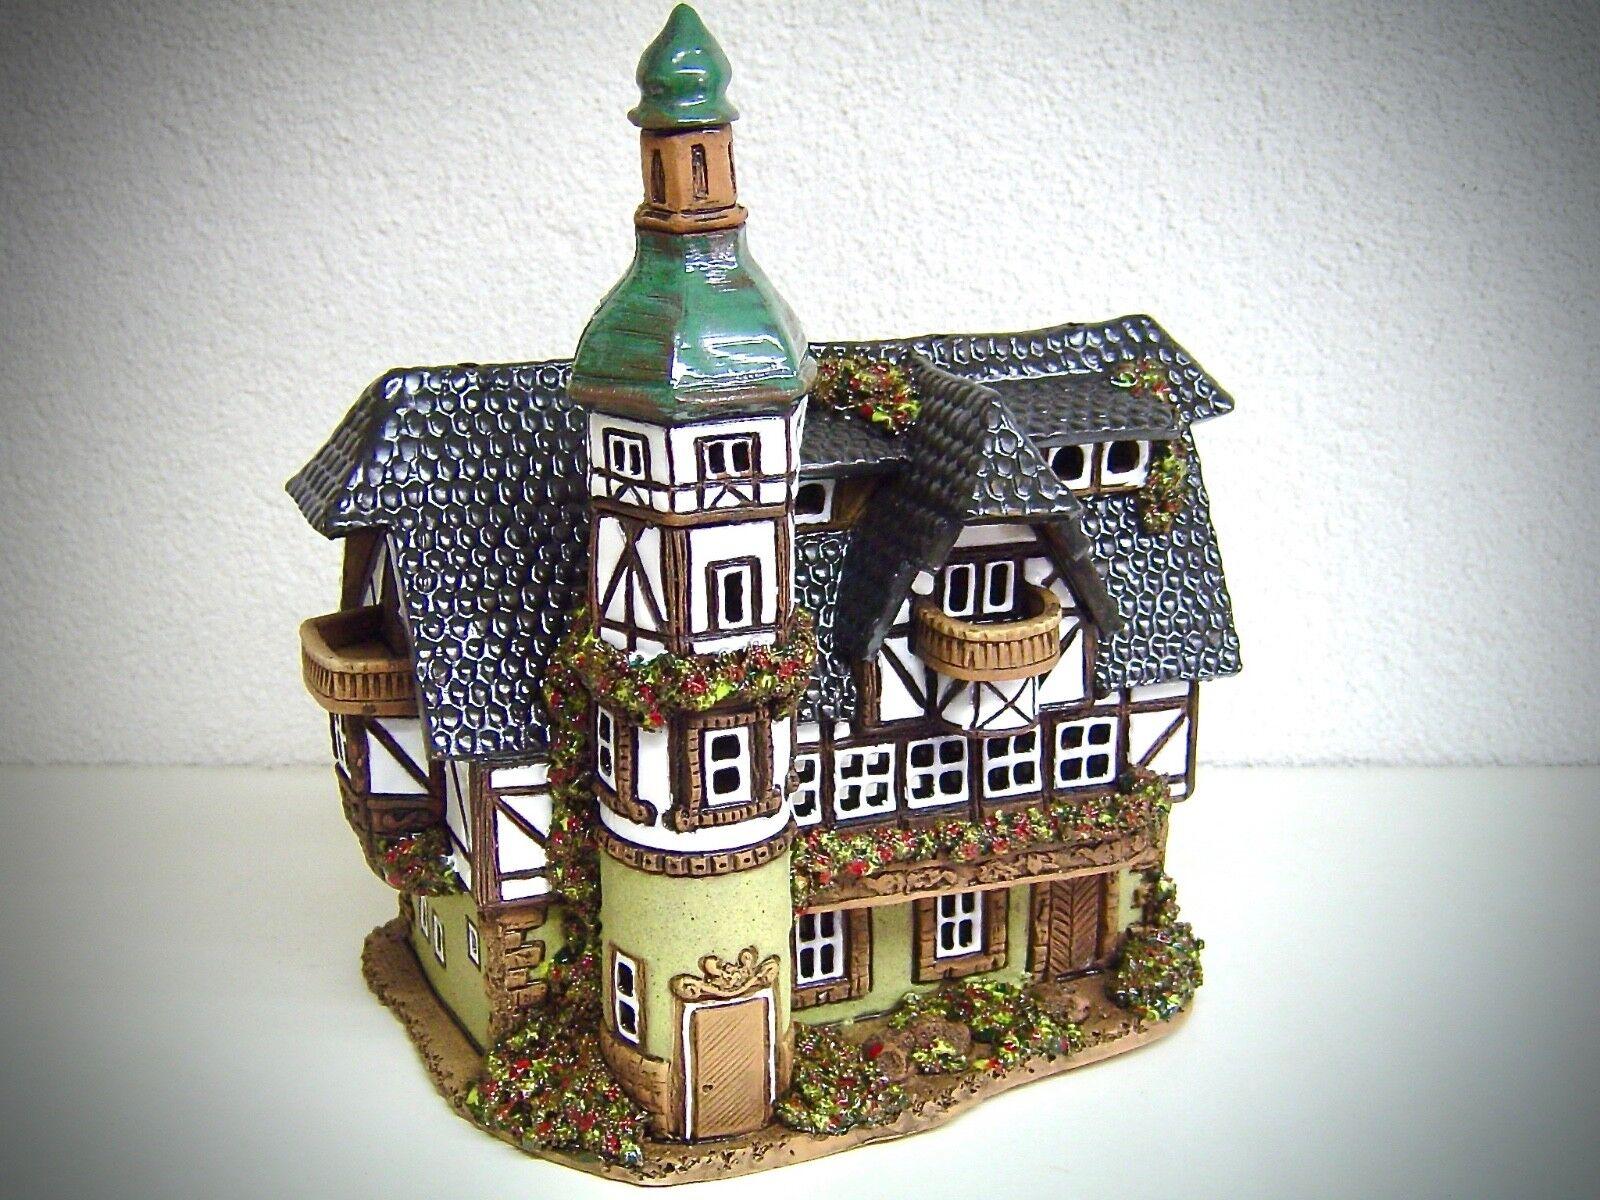 Cerámica teelichthaus luces casa teelichthalter especializada obra casa 21 cm 40516